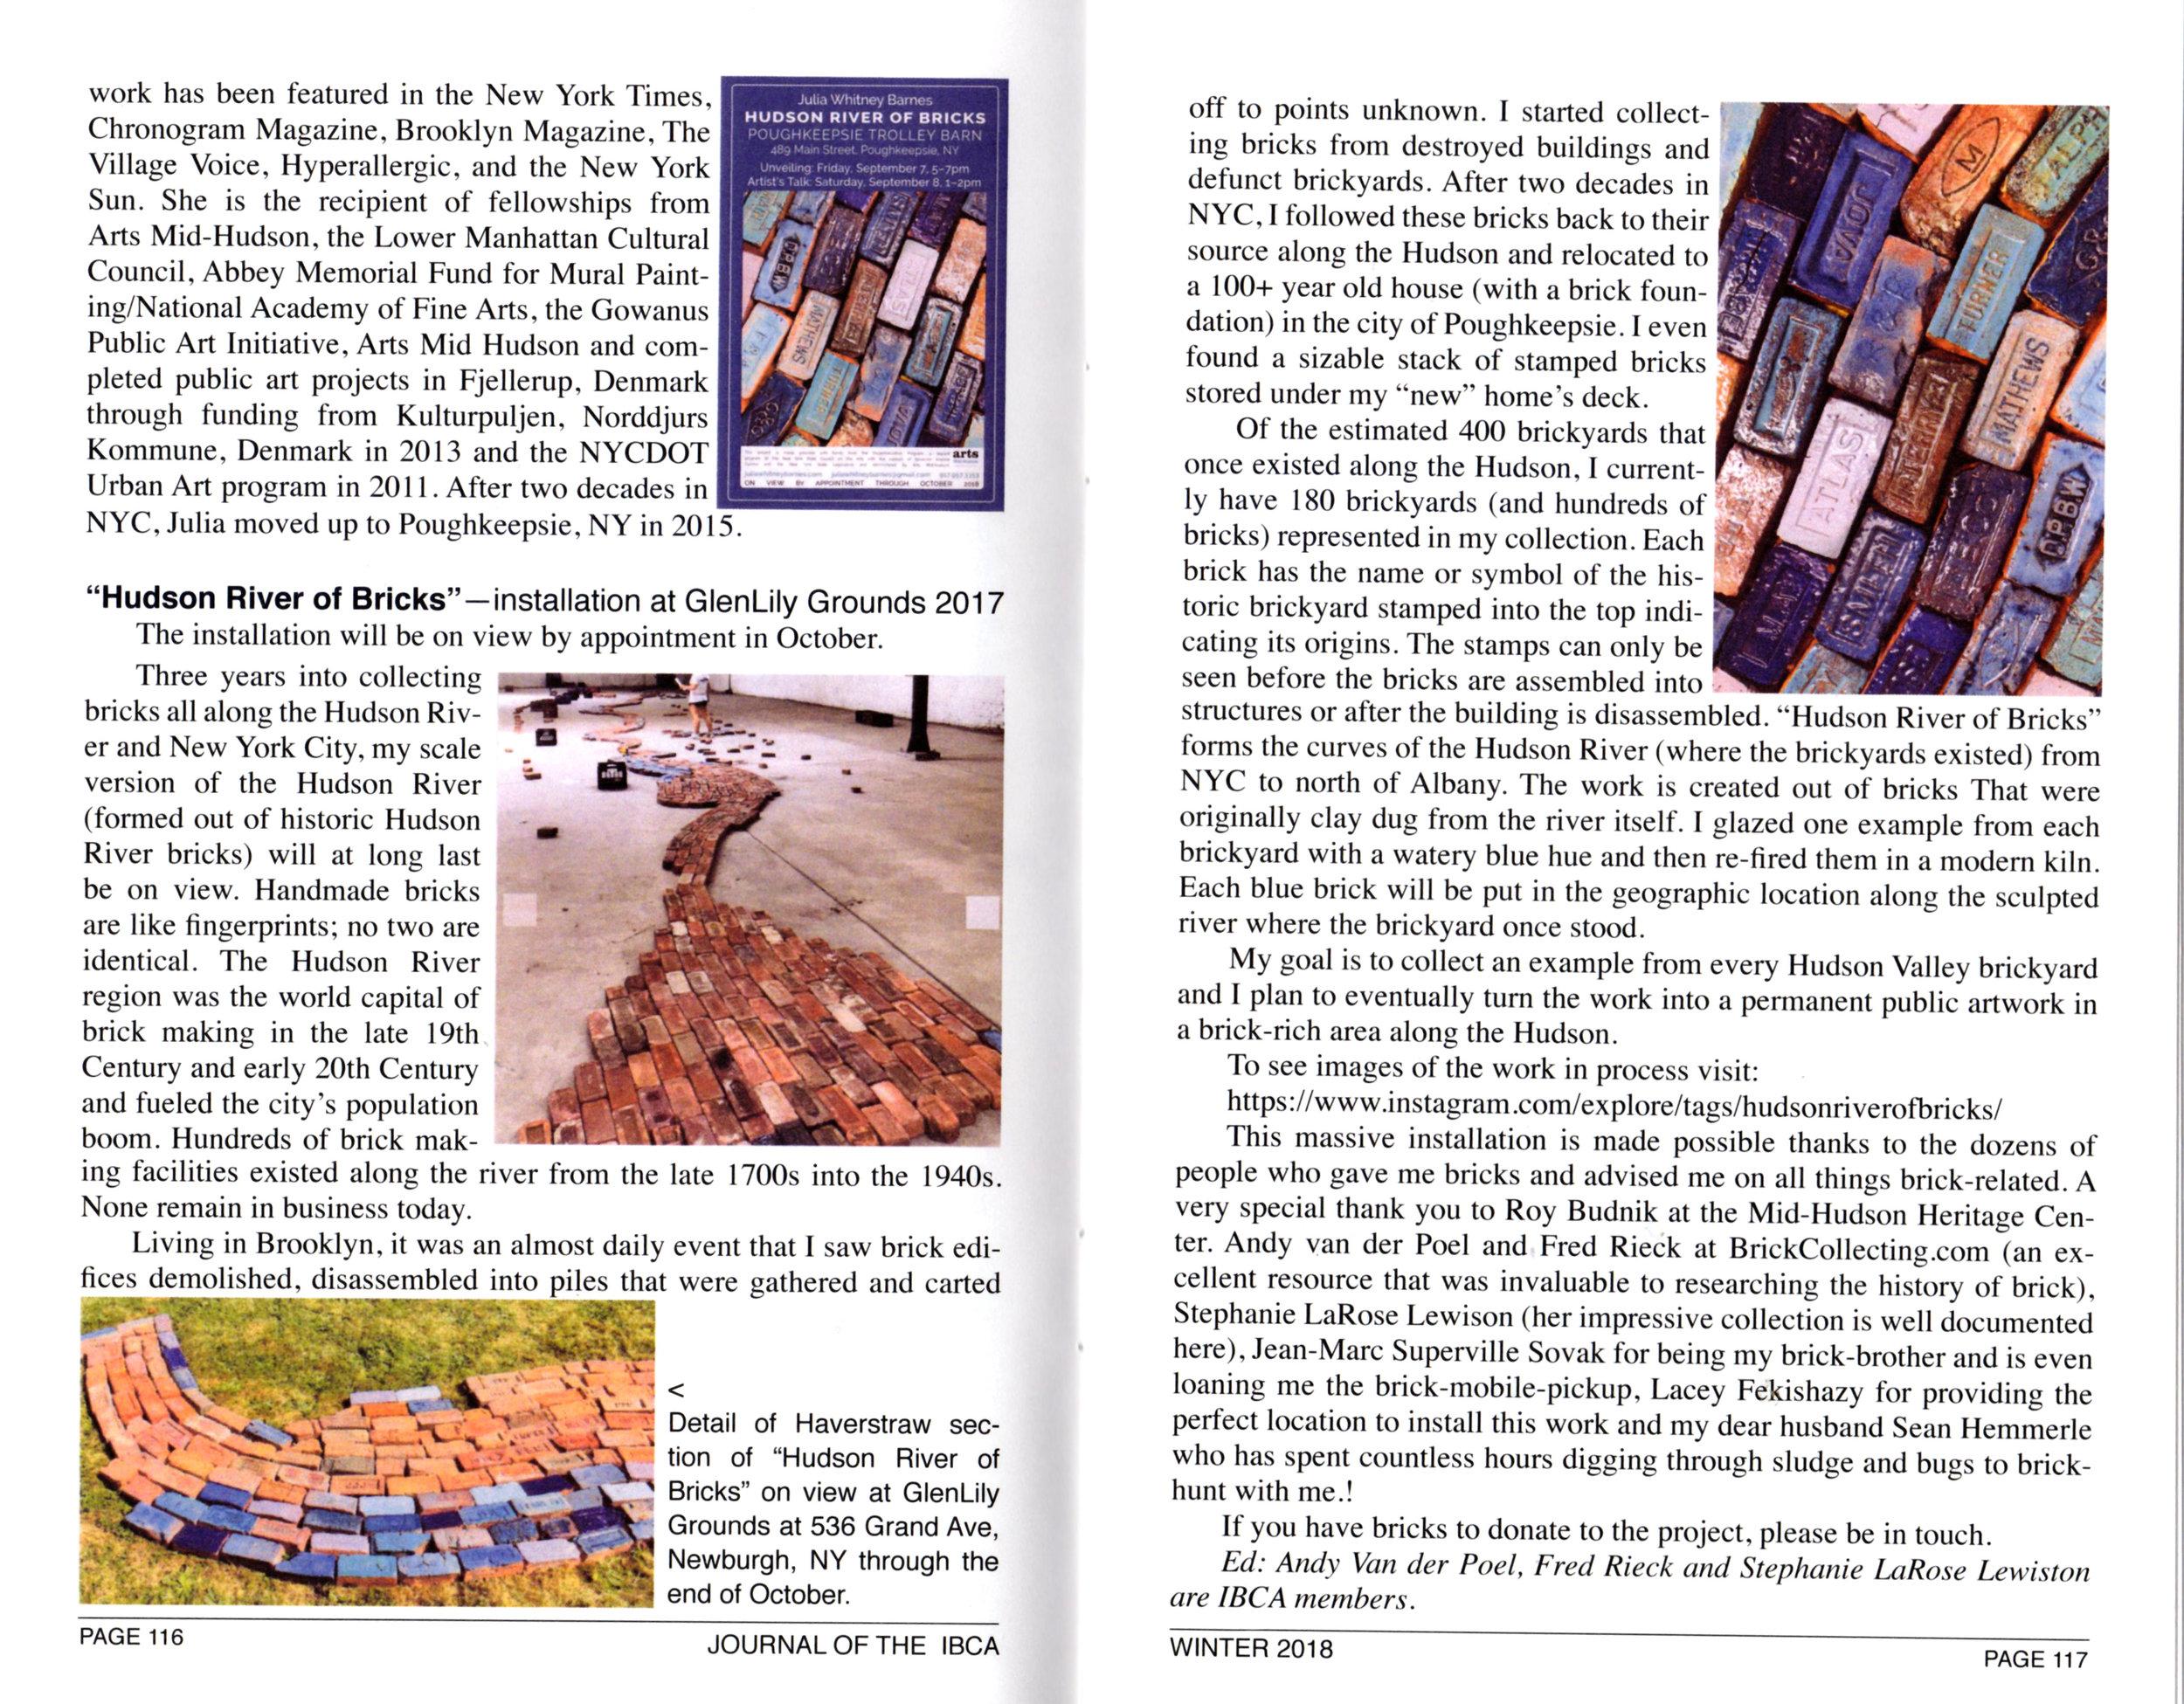 Journal of the International Brick Collectors Association